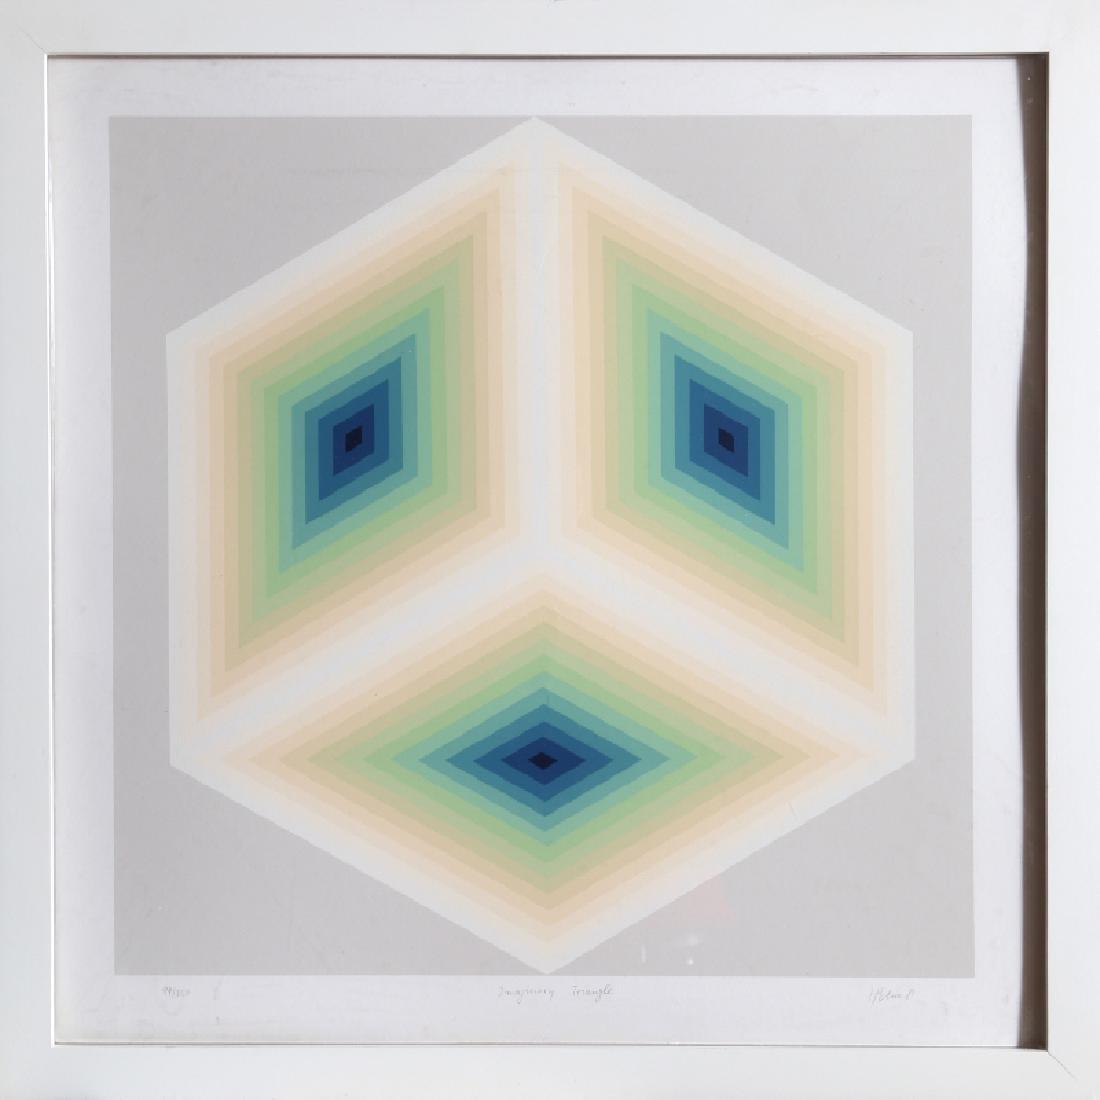 Jurgen Peters, Imaginary Triangle, Serigraph,